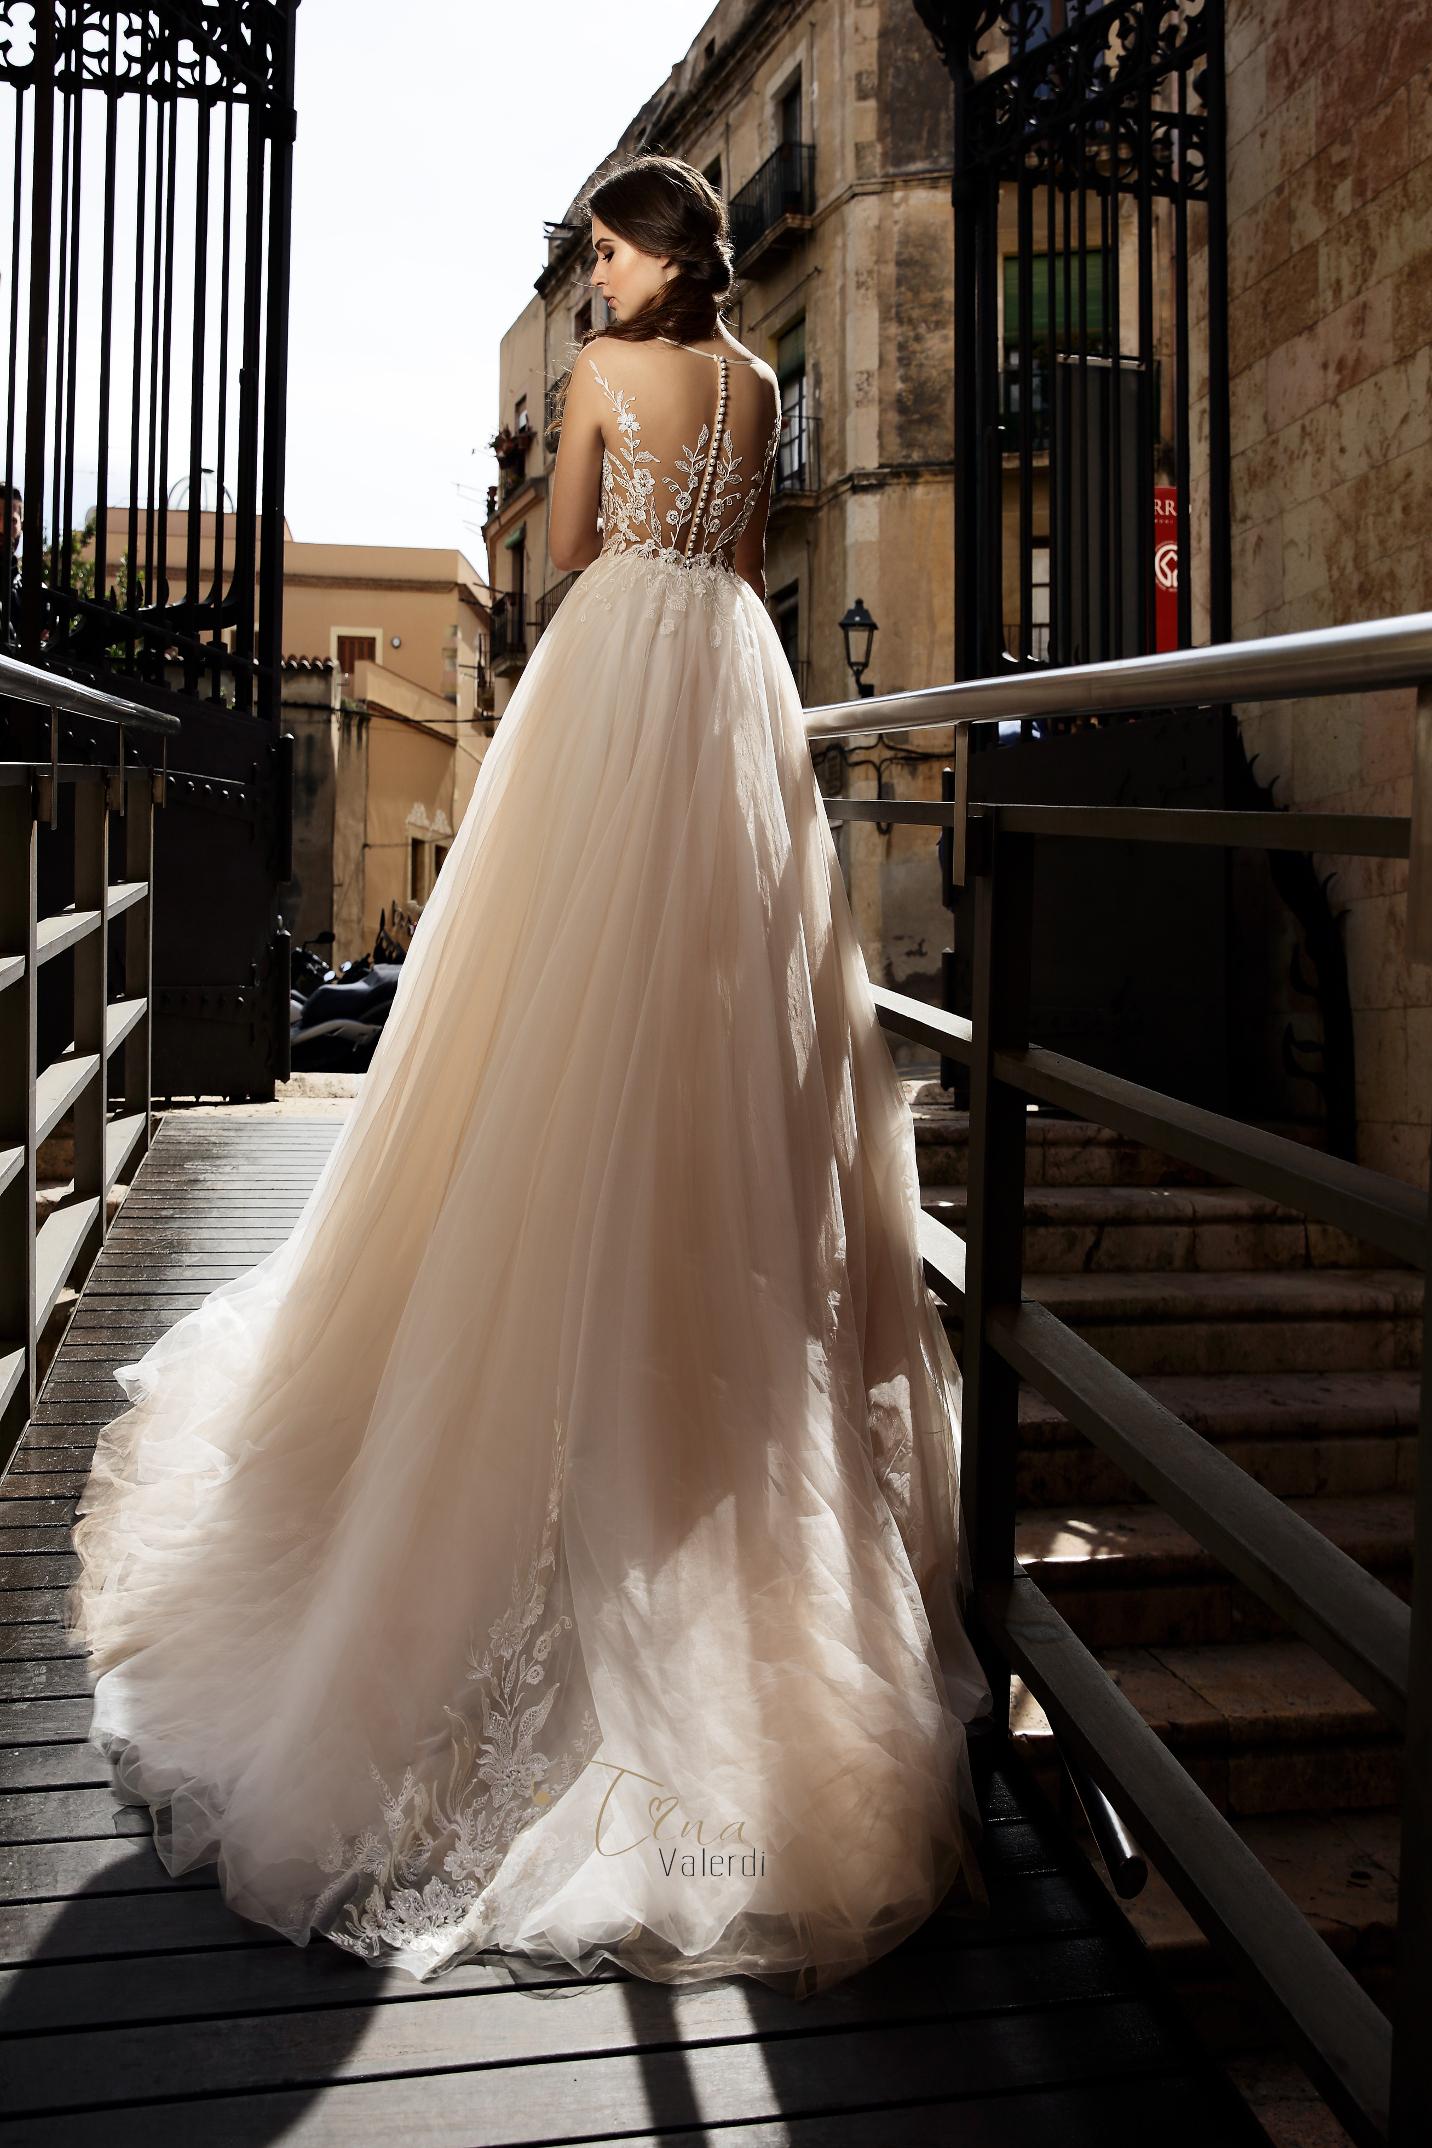 vestuvines sukneles tina valerdi Paloma4